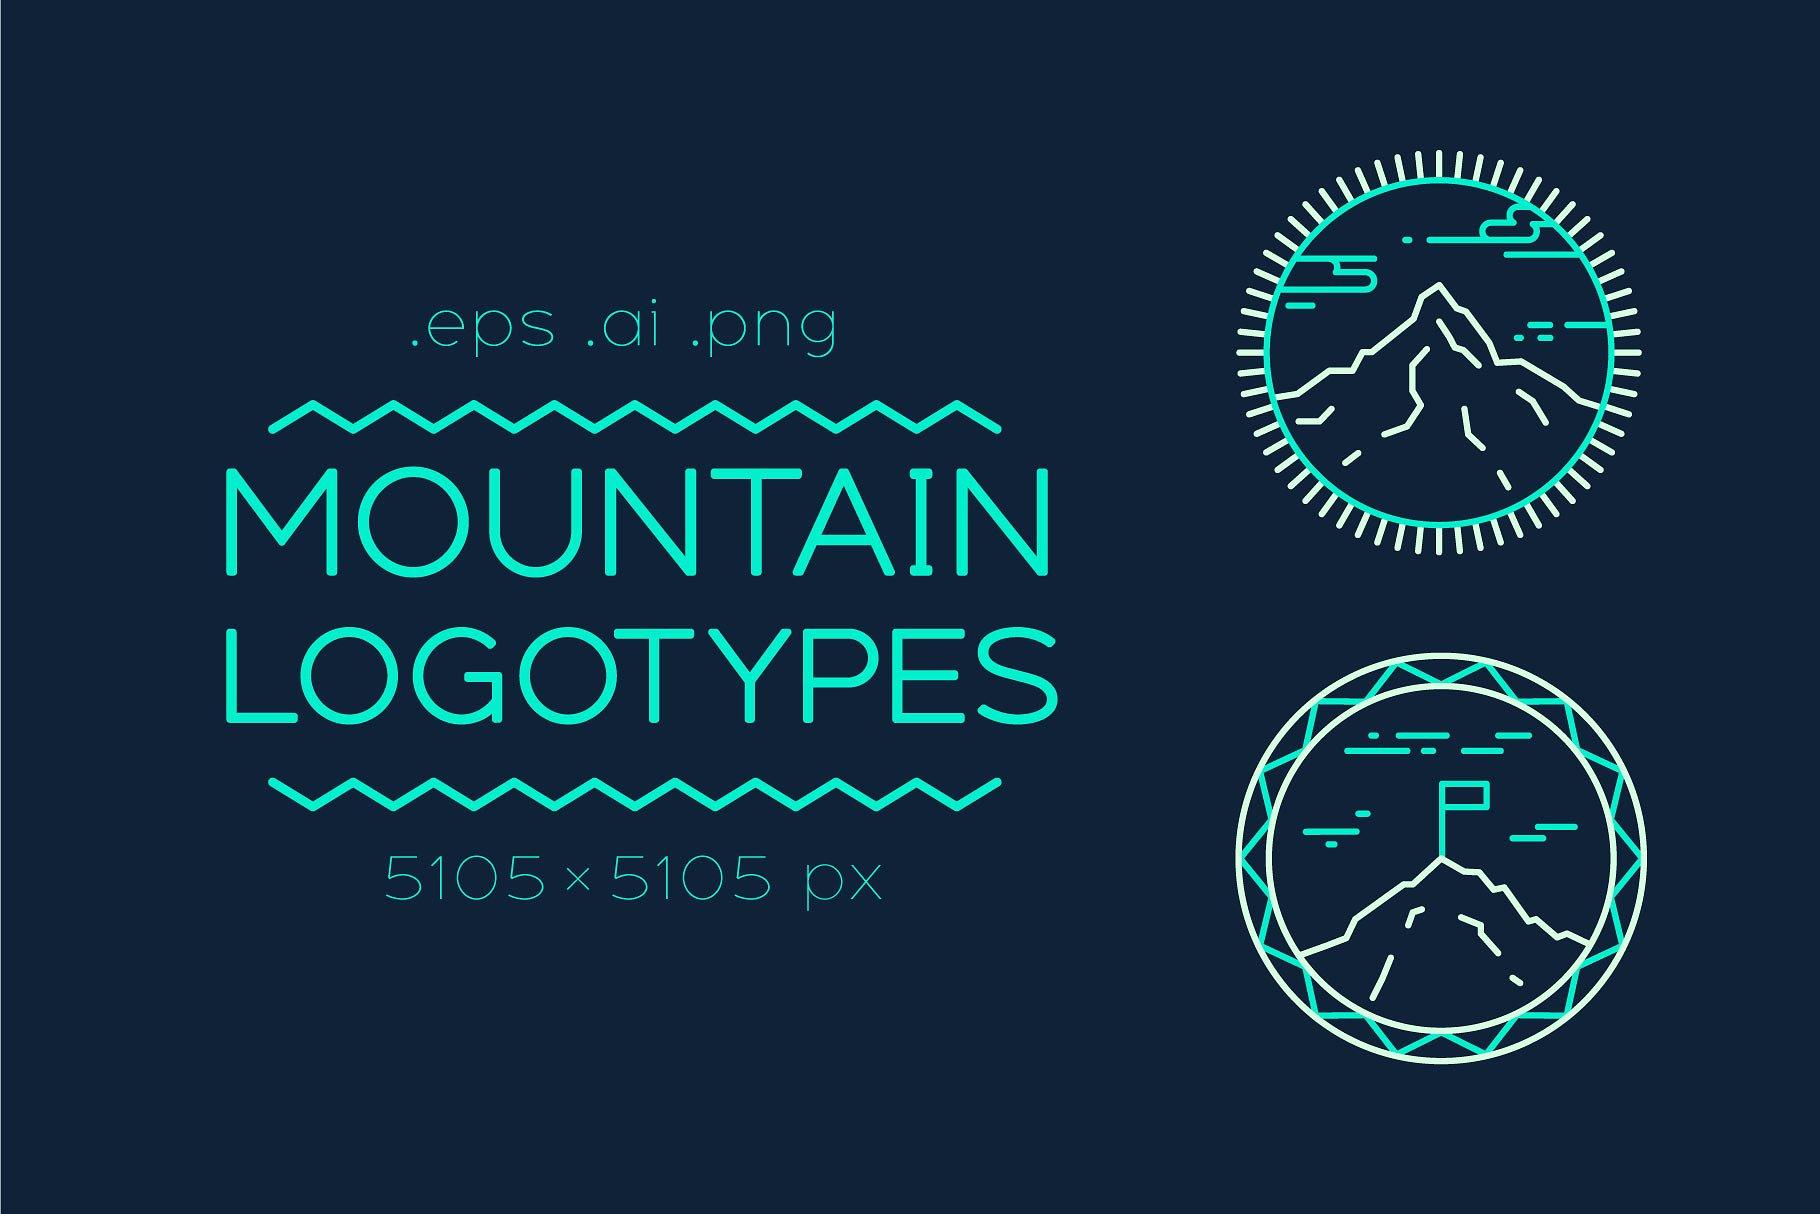 cover_mountain_logotypes_001-1.jpg